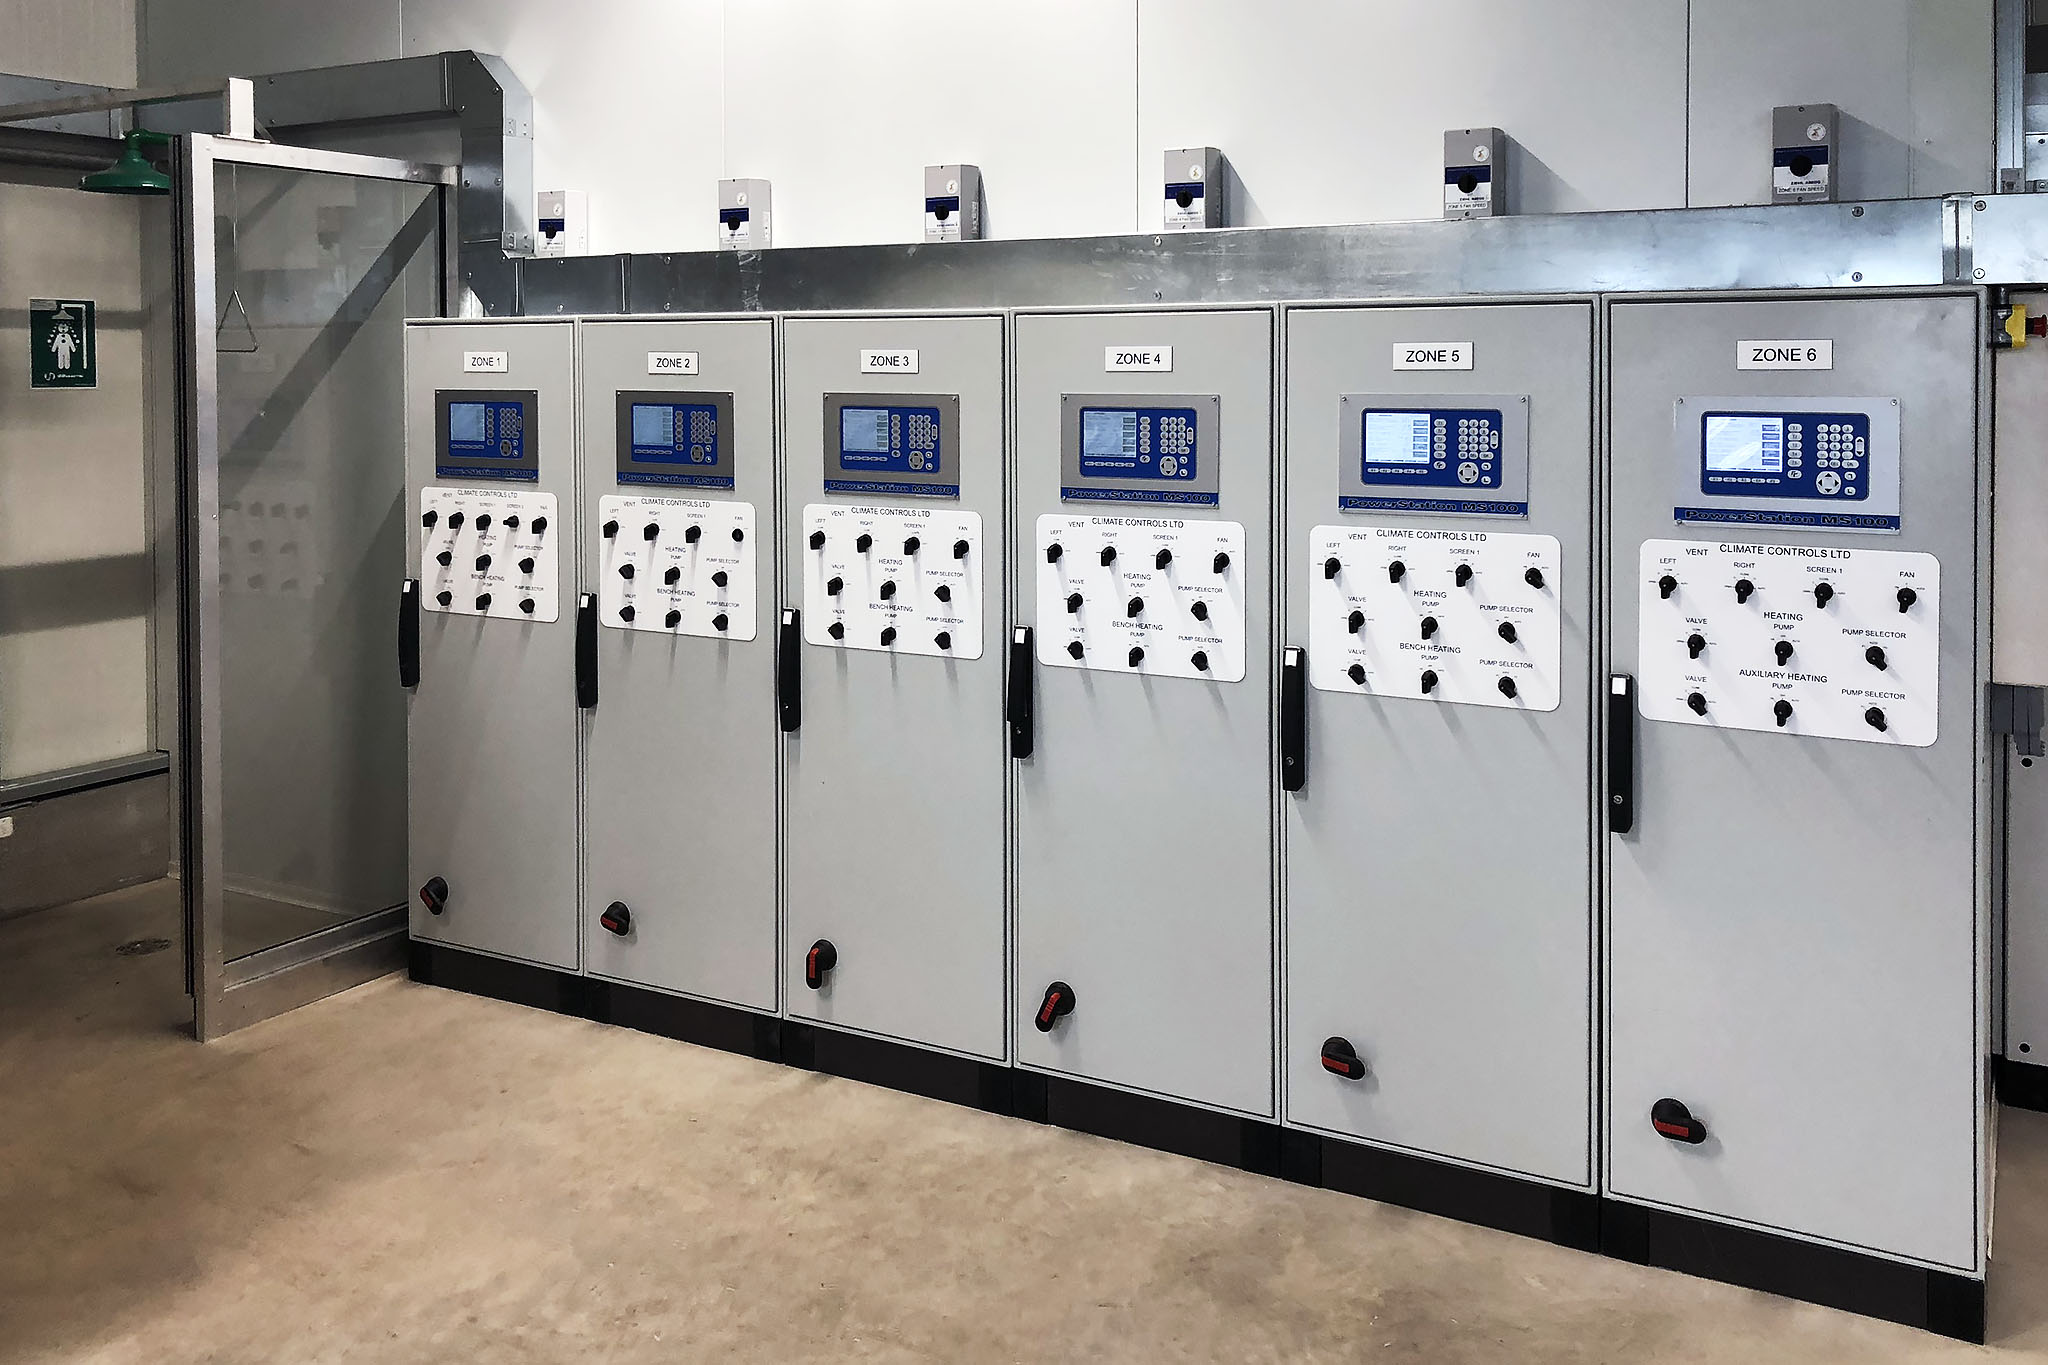 Greenhouse computerised environment controls